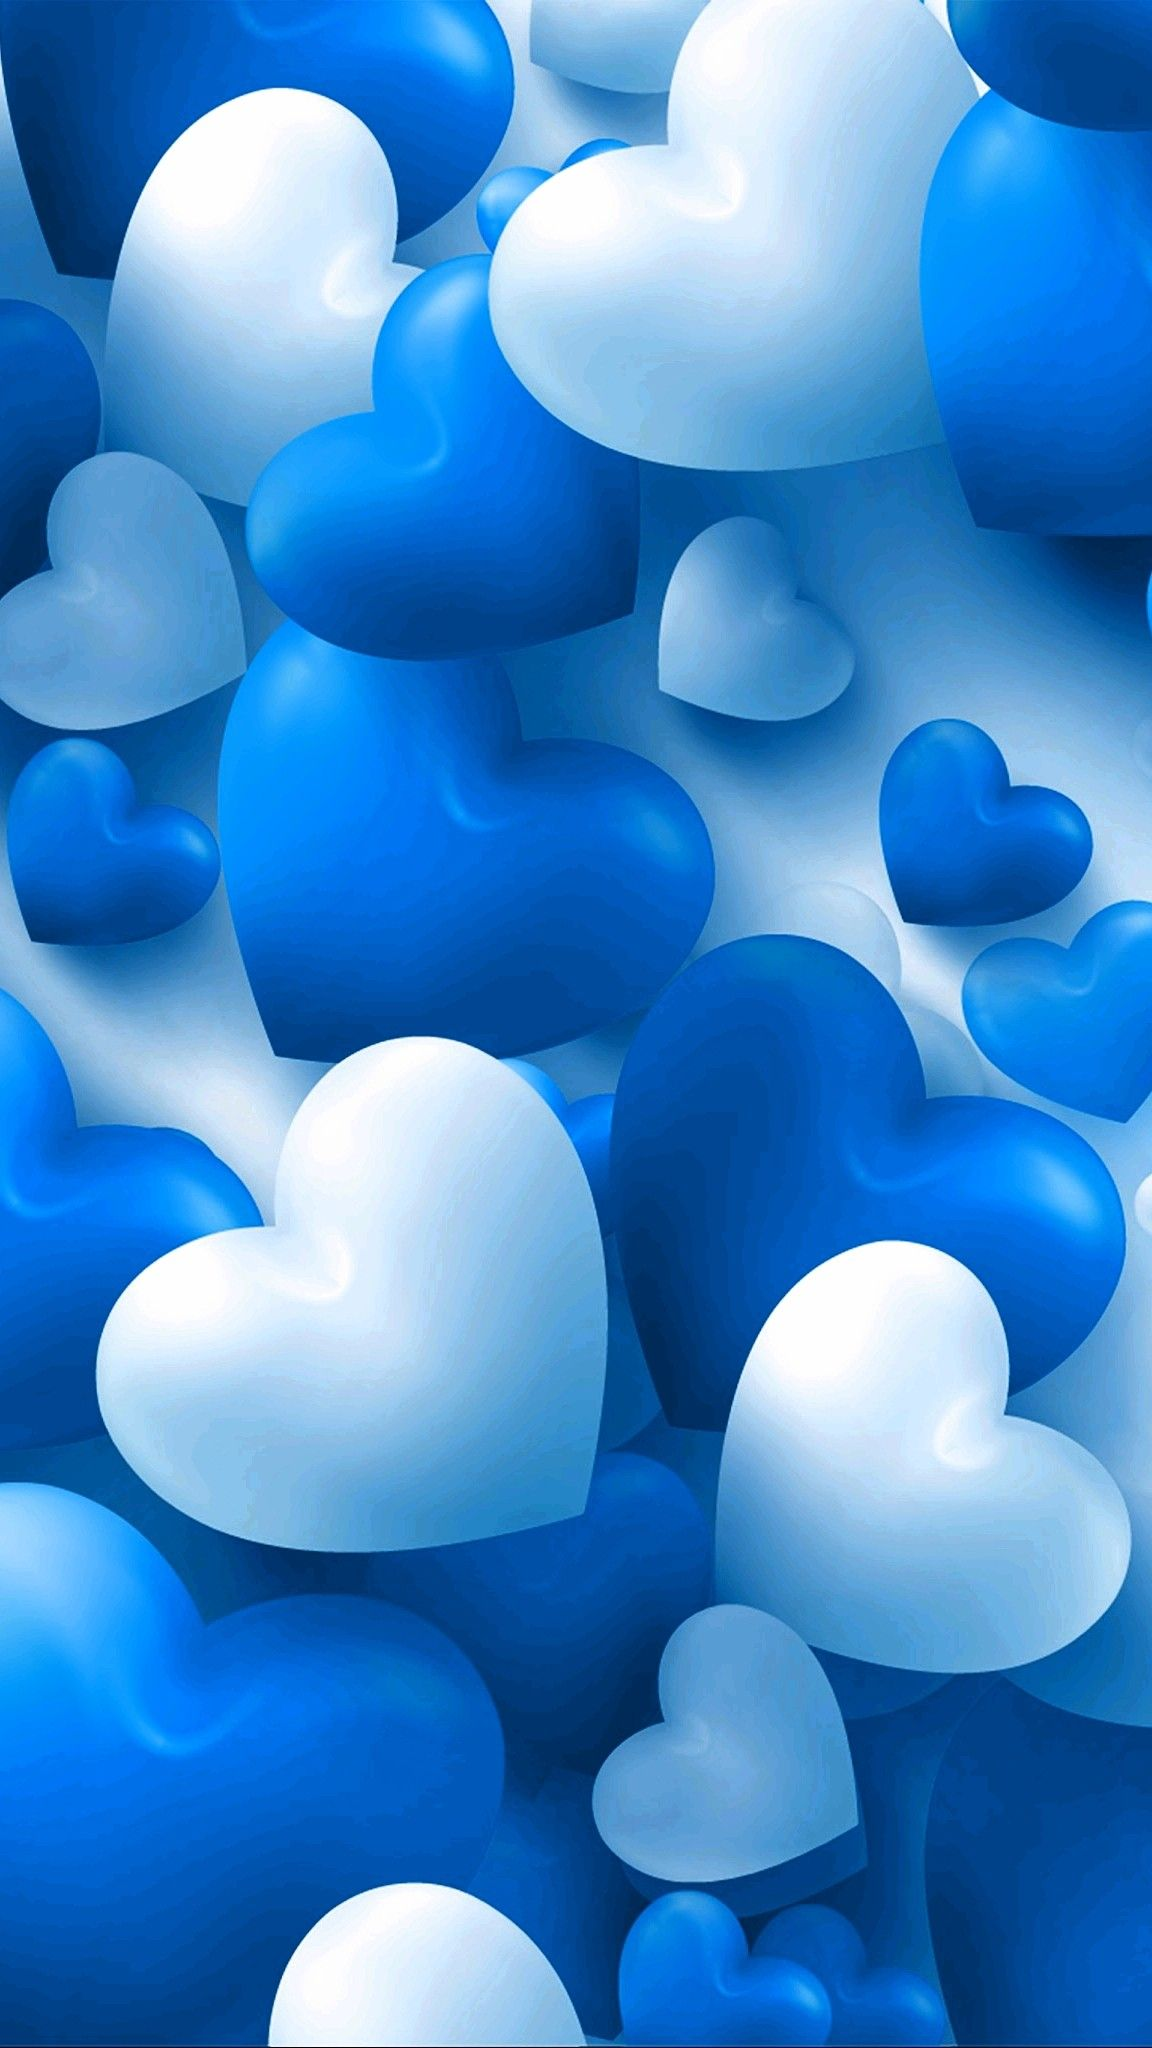 Pin By Borboleta Inspiradora On Love Heart Wallpaper Colourful Wallpaper Iphone Bubbles Wallpaper